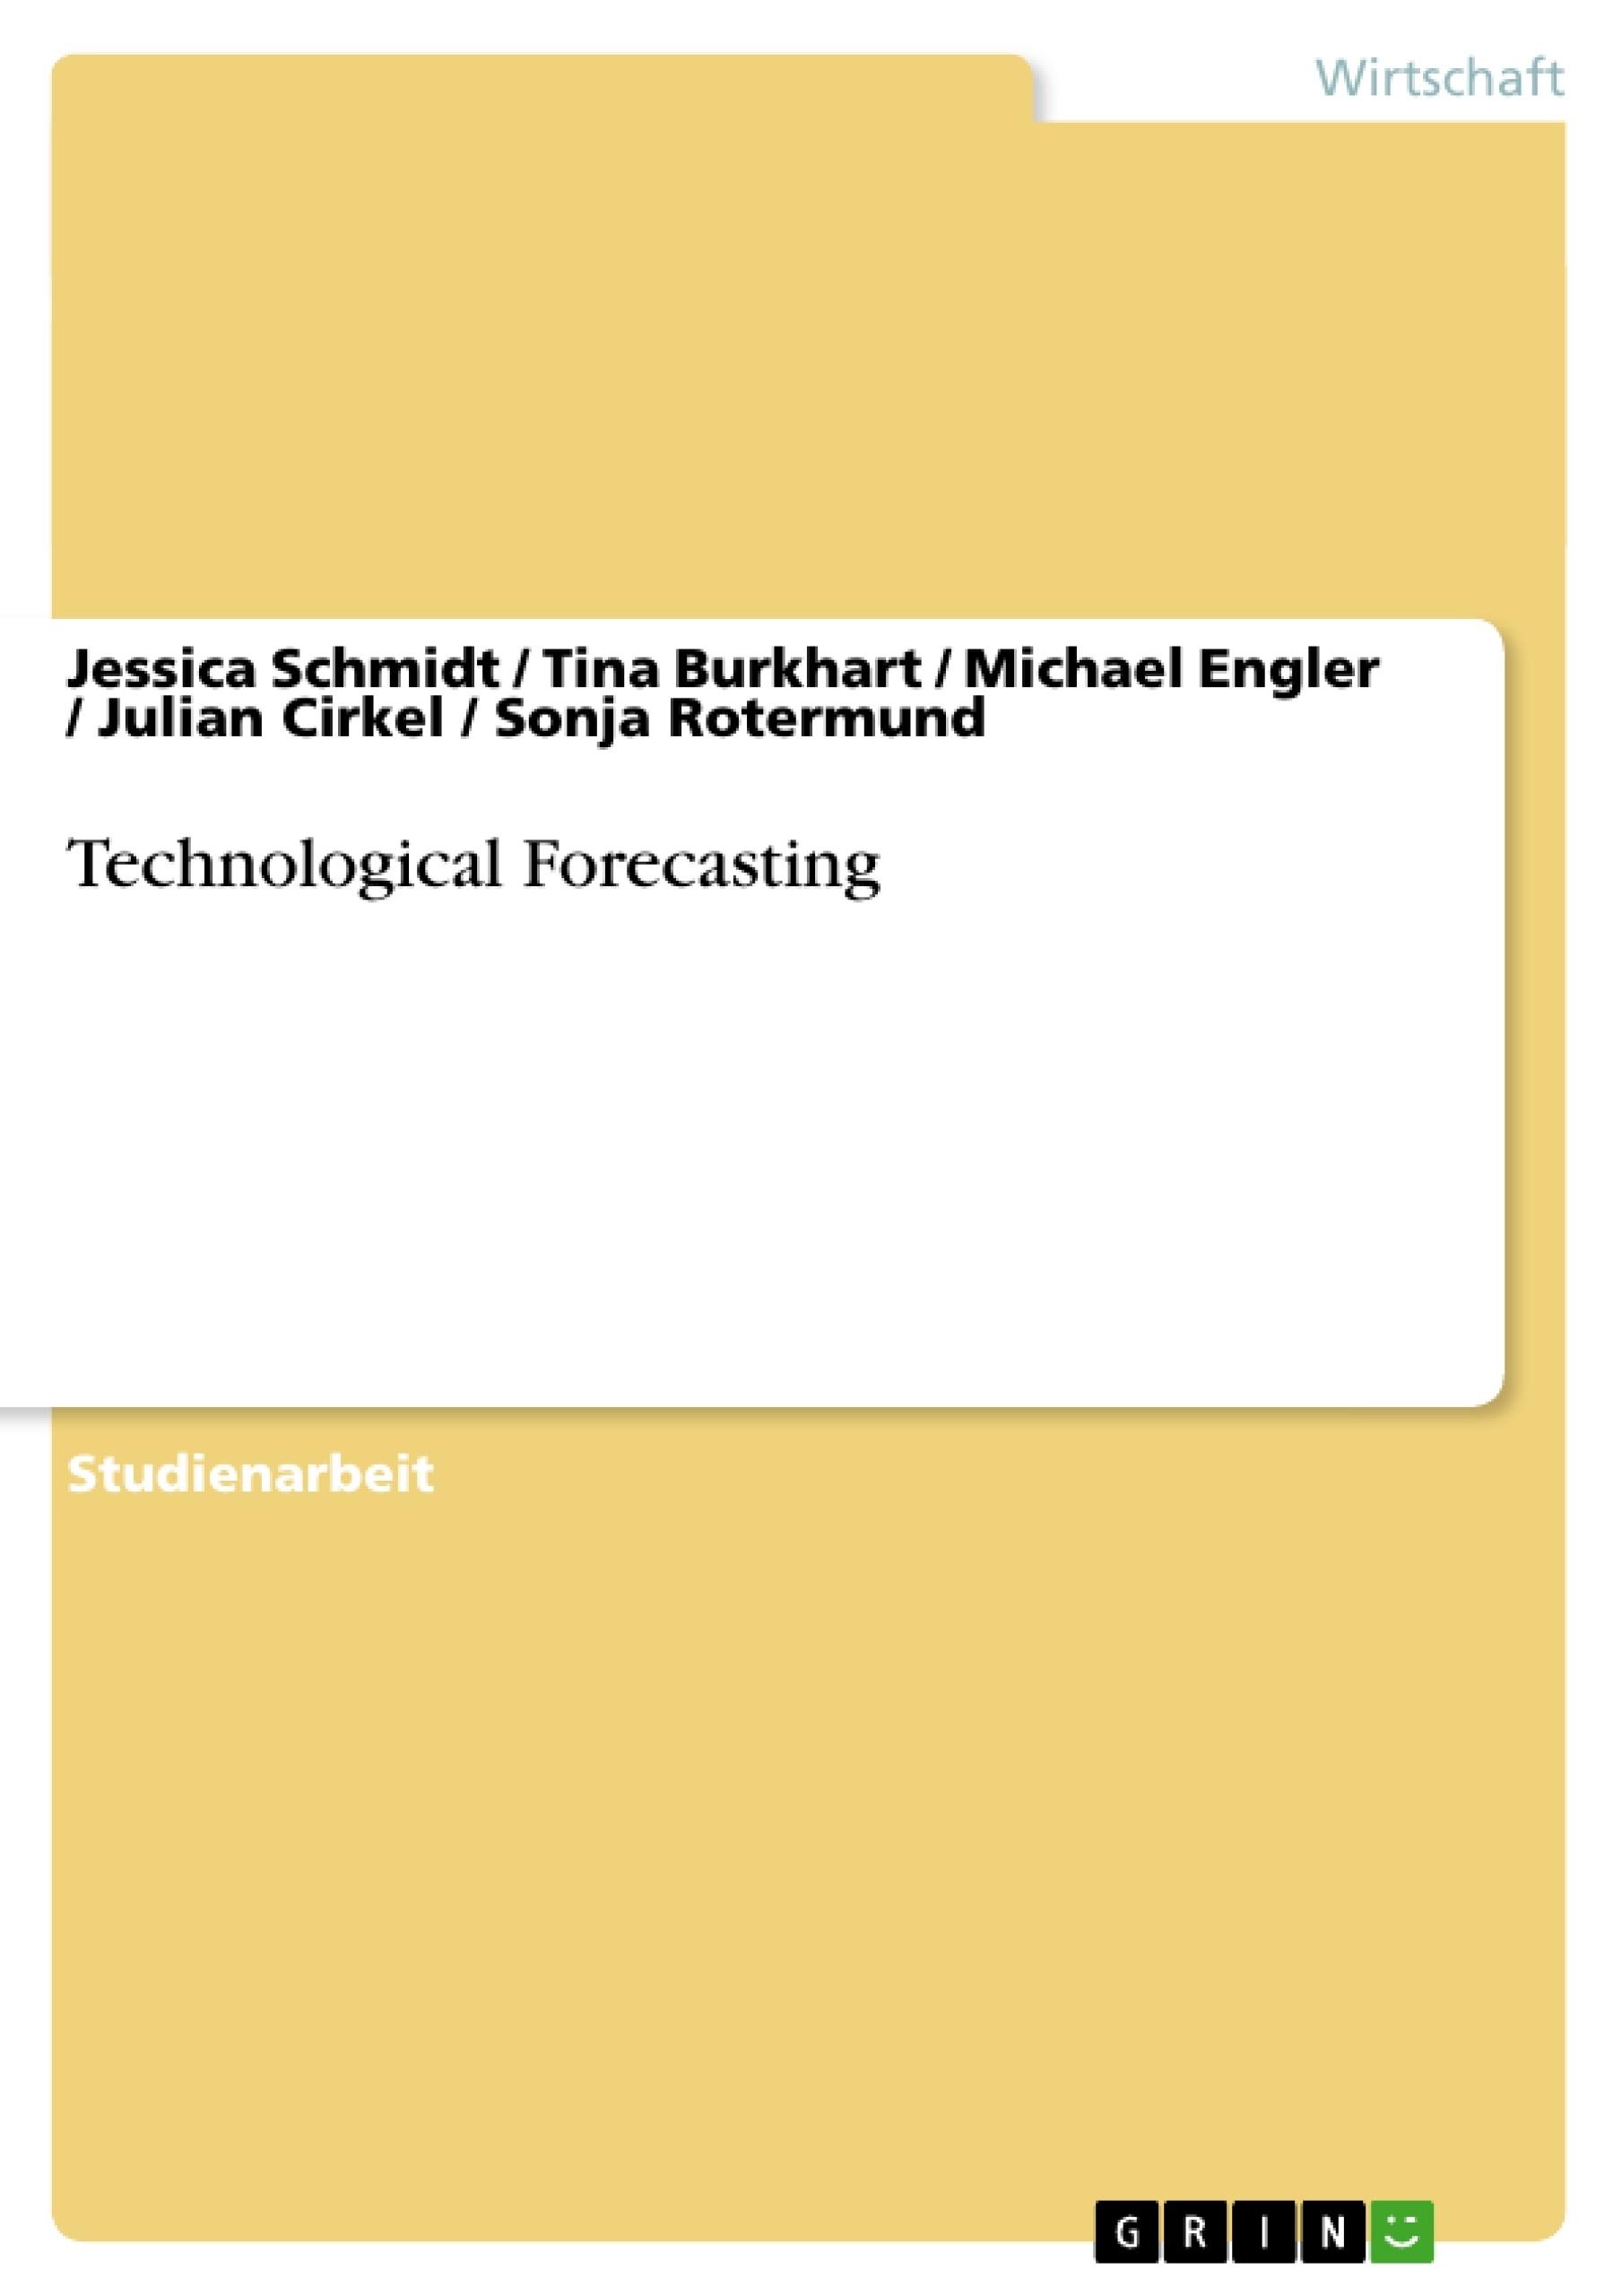 Titel: Technological Forecasting